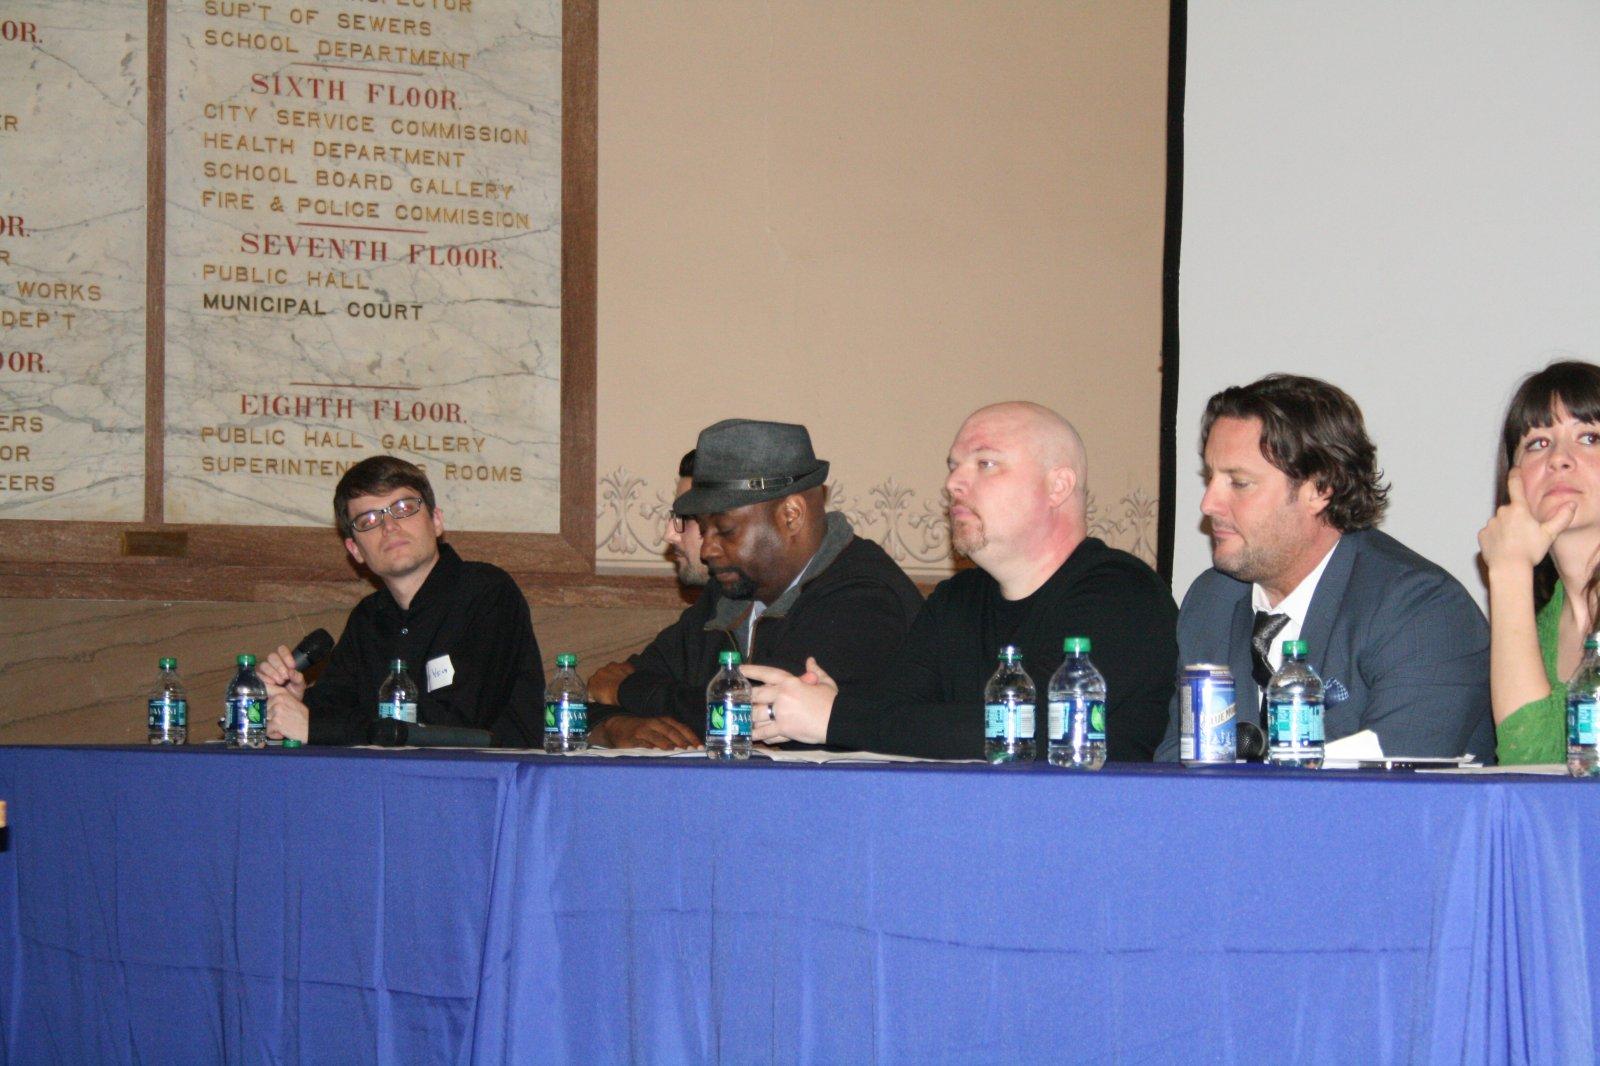 Matt Wild, Fernando Reyes, Derek Mosley, Jason Korb, Rick Barrett, and Anna-Marie Opgenorth.